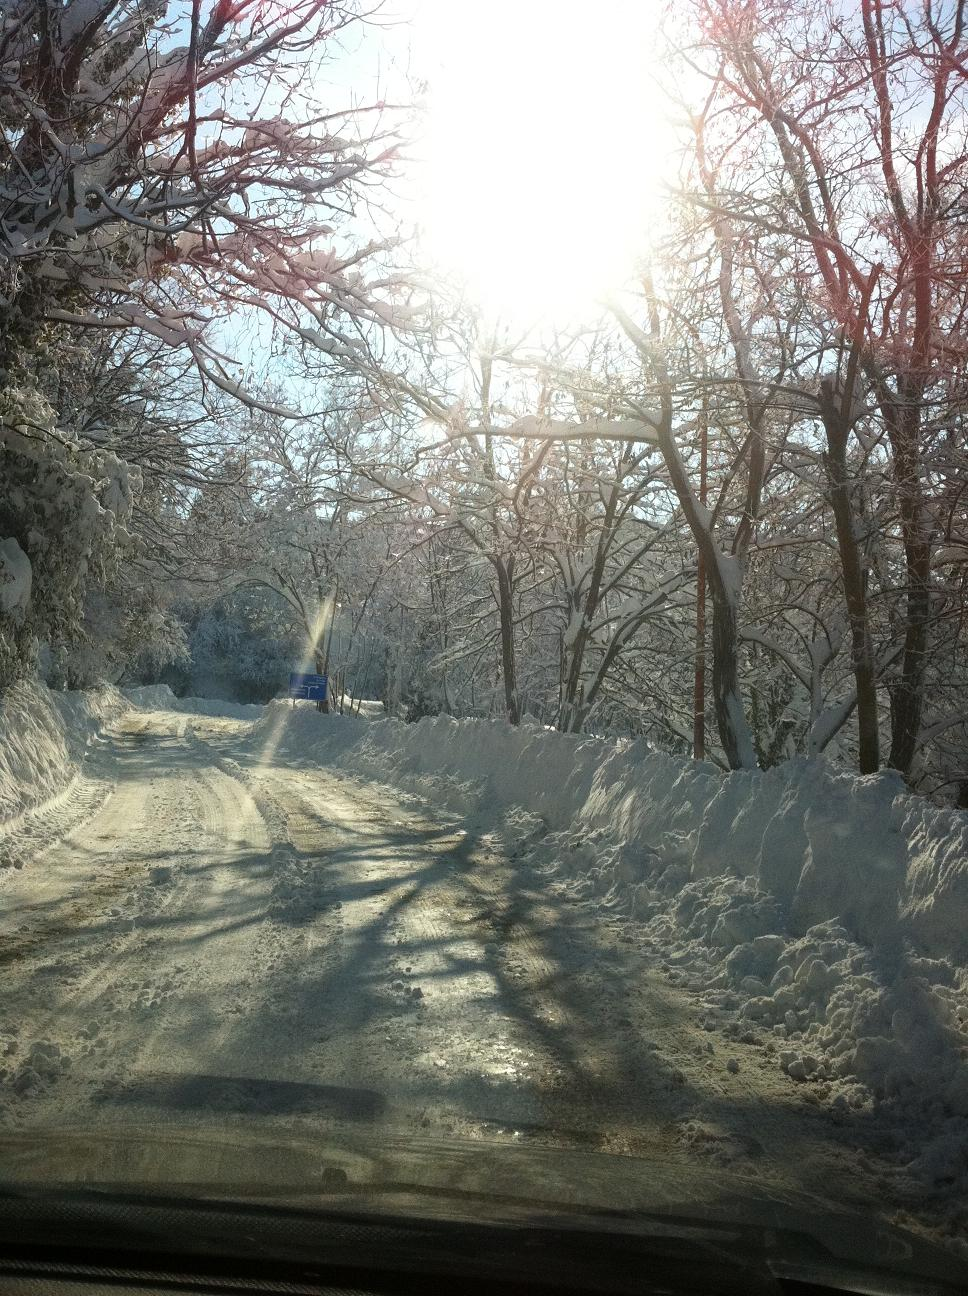 Neve a Ripatransone, 11 febbraio 2012 foto Silvia Basili 3